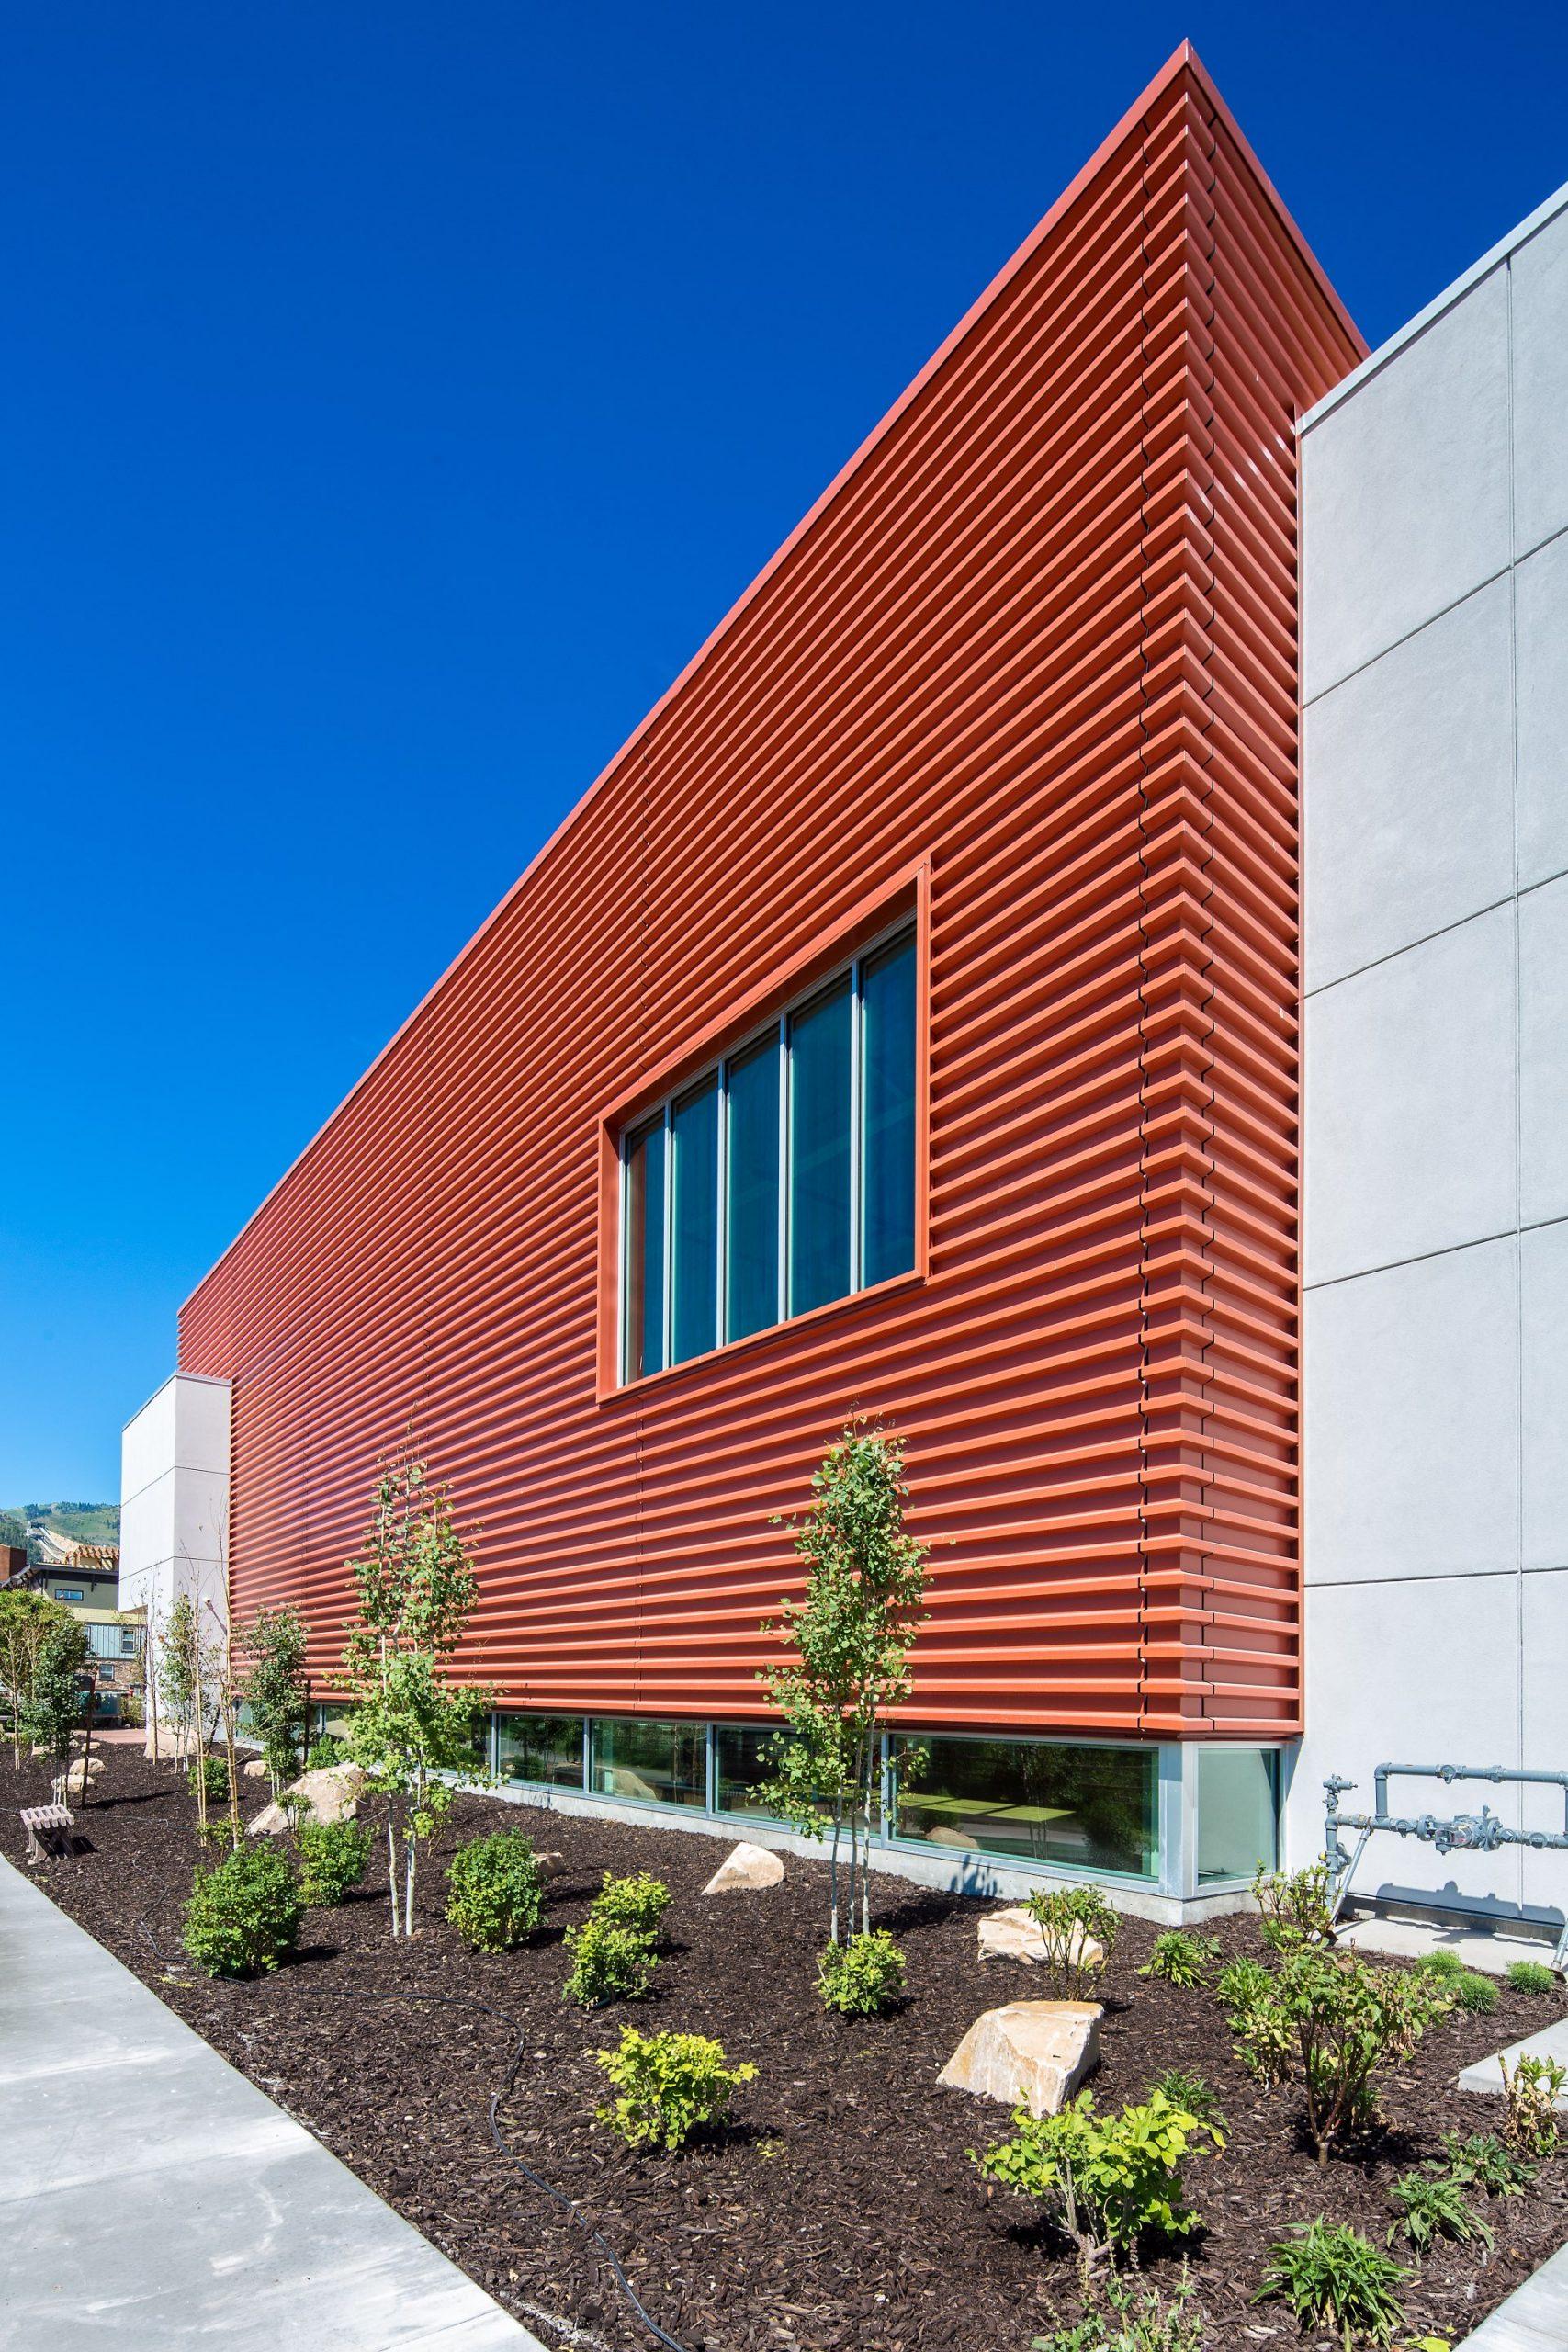 Basin Recreation Fieldhouse Expansion, architectural design by Elliott Workgroup